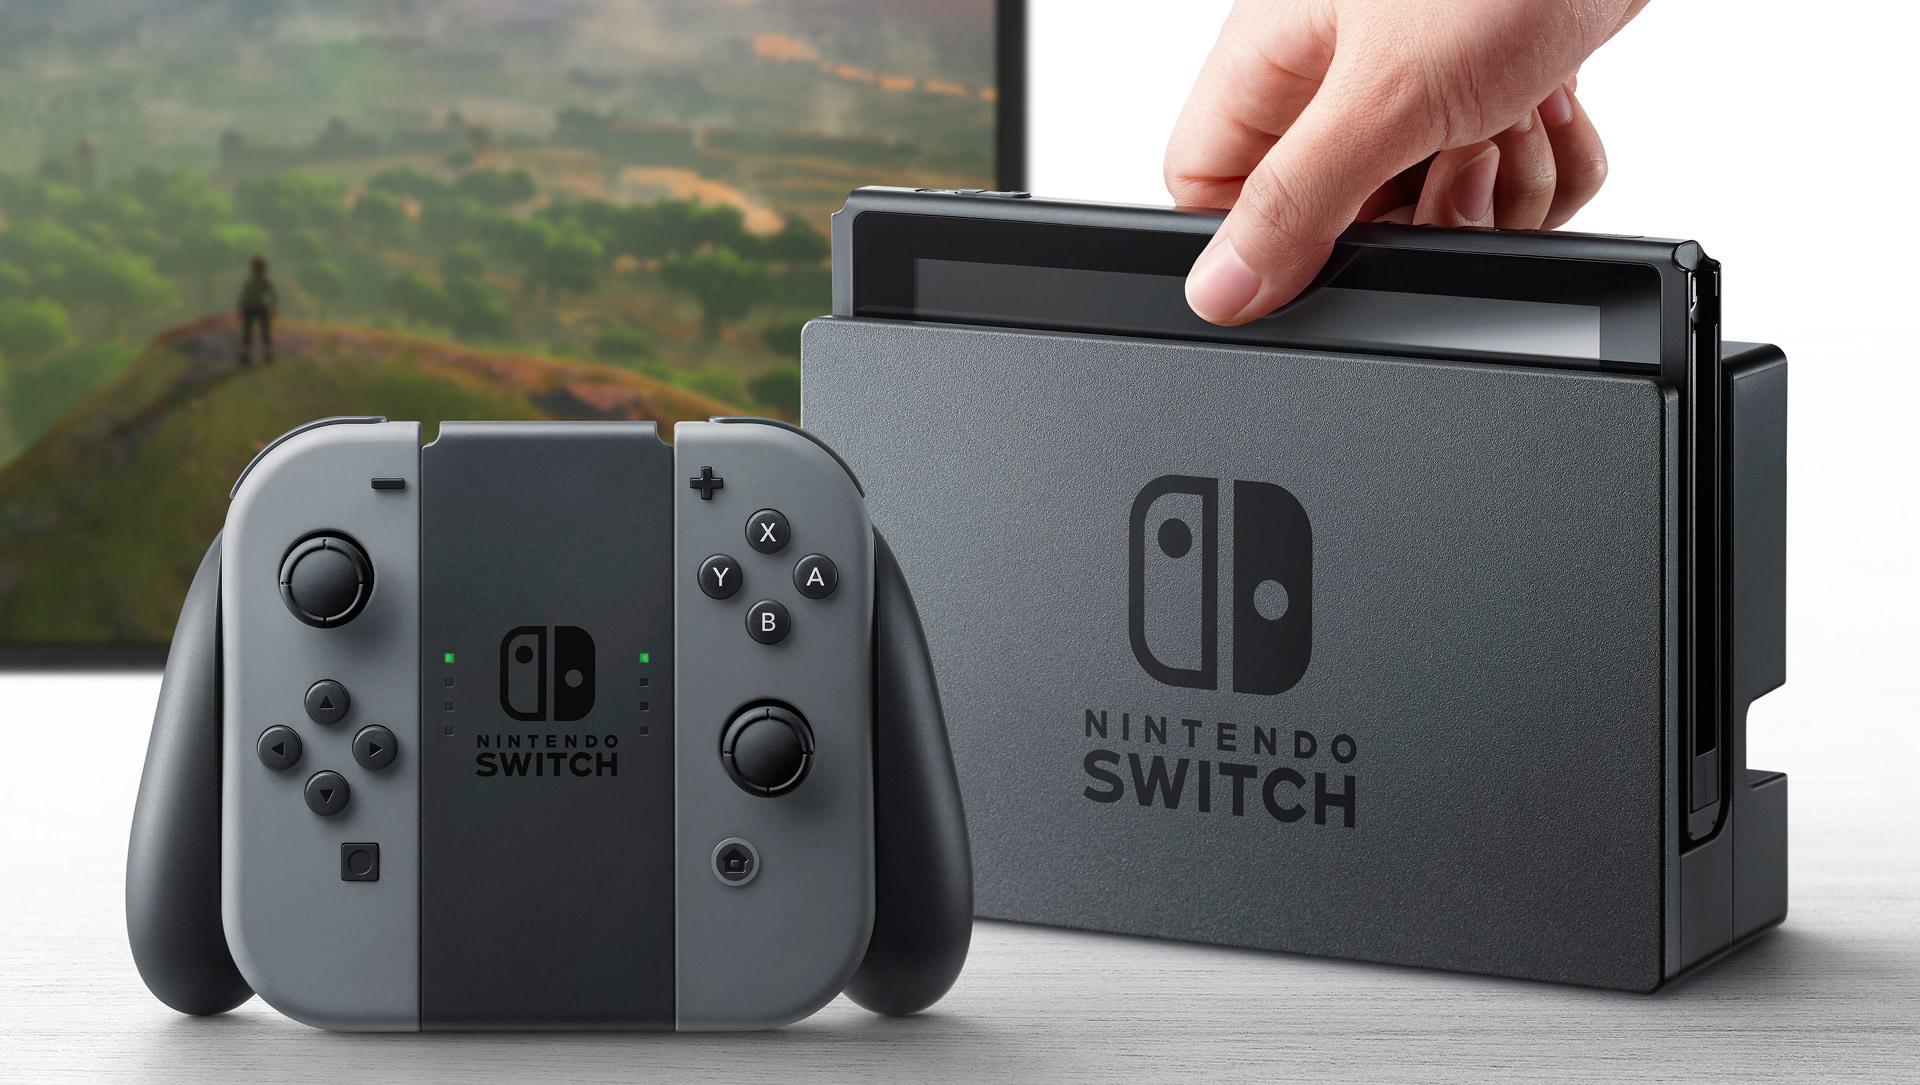 Recuerden si ven un emulador de Nintendo Switch por ahí es muy posible que sea falso [SCAM]